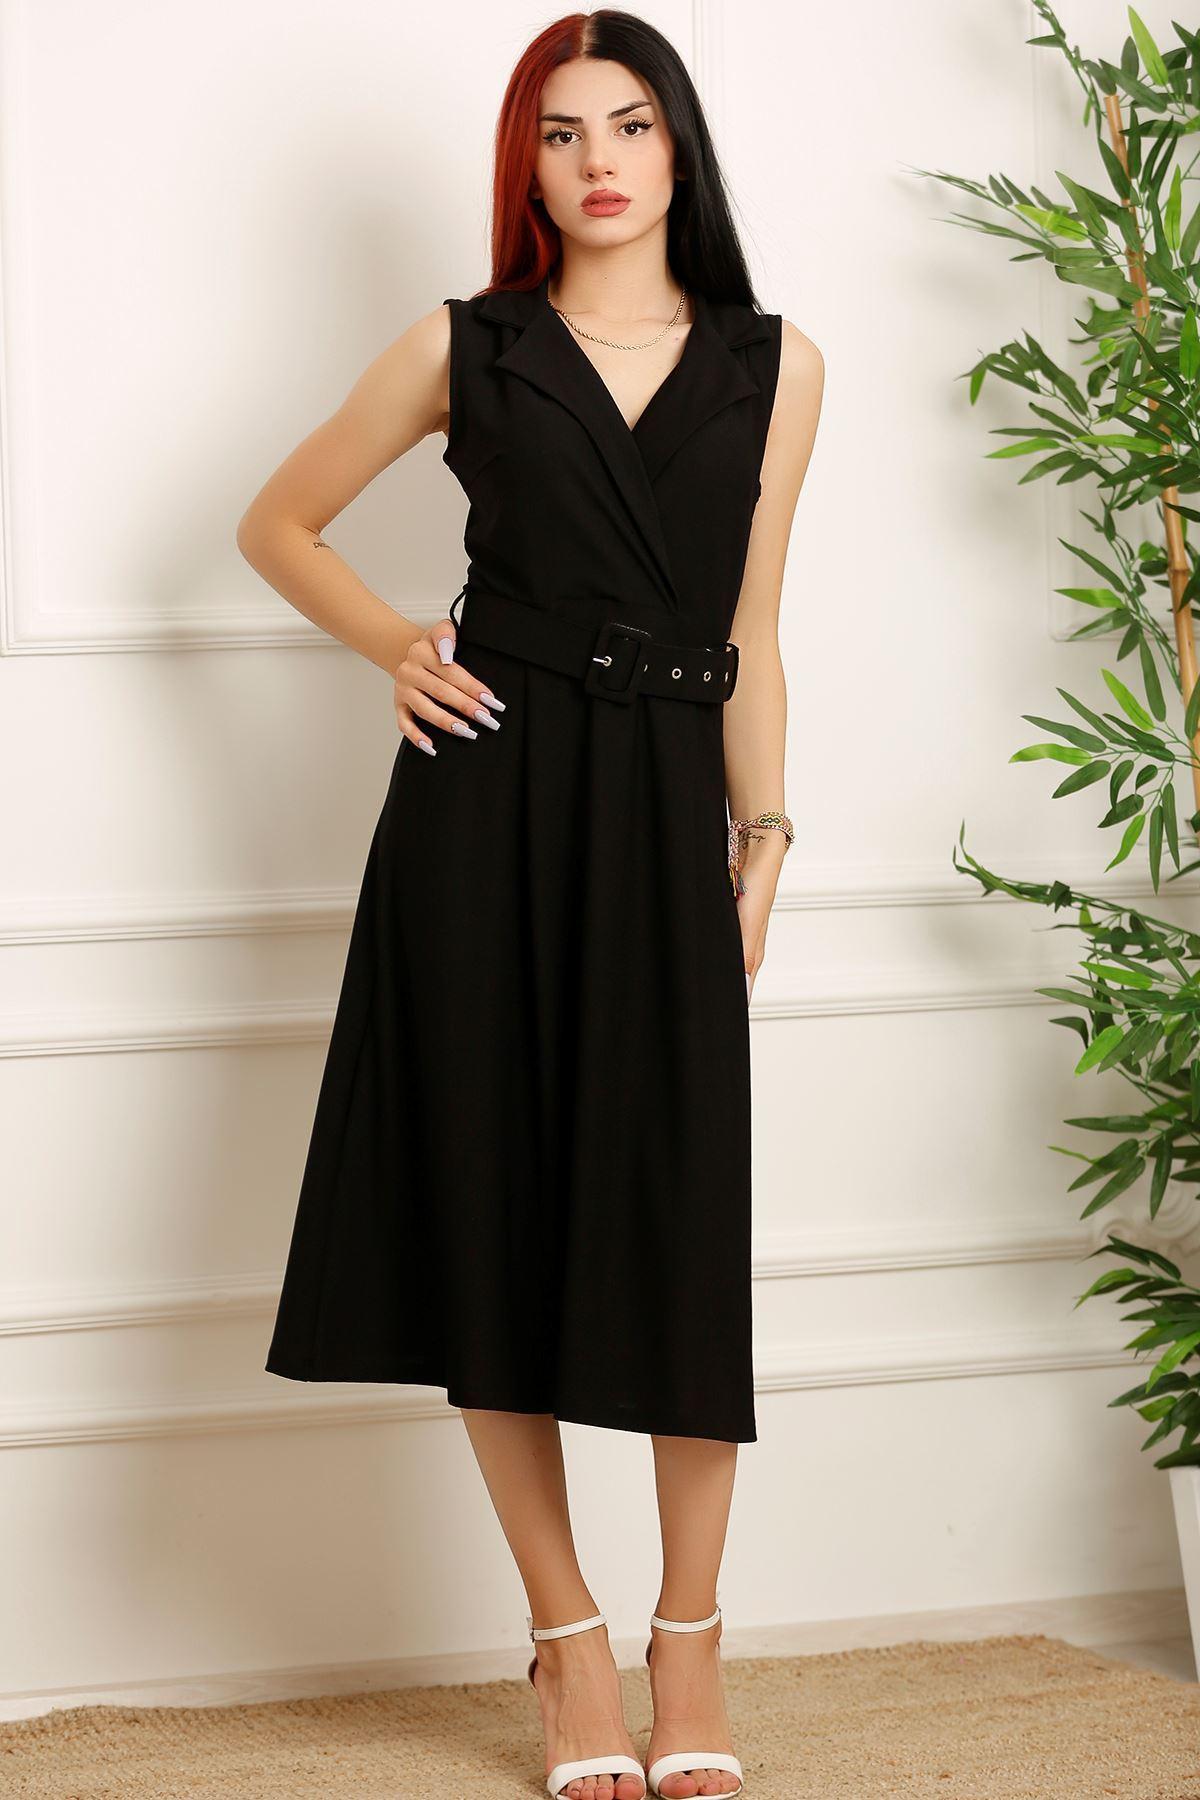 Kemerli Klasik Yaka Elbise Siyah - 2508.994.